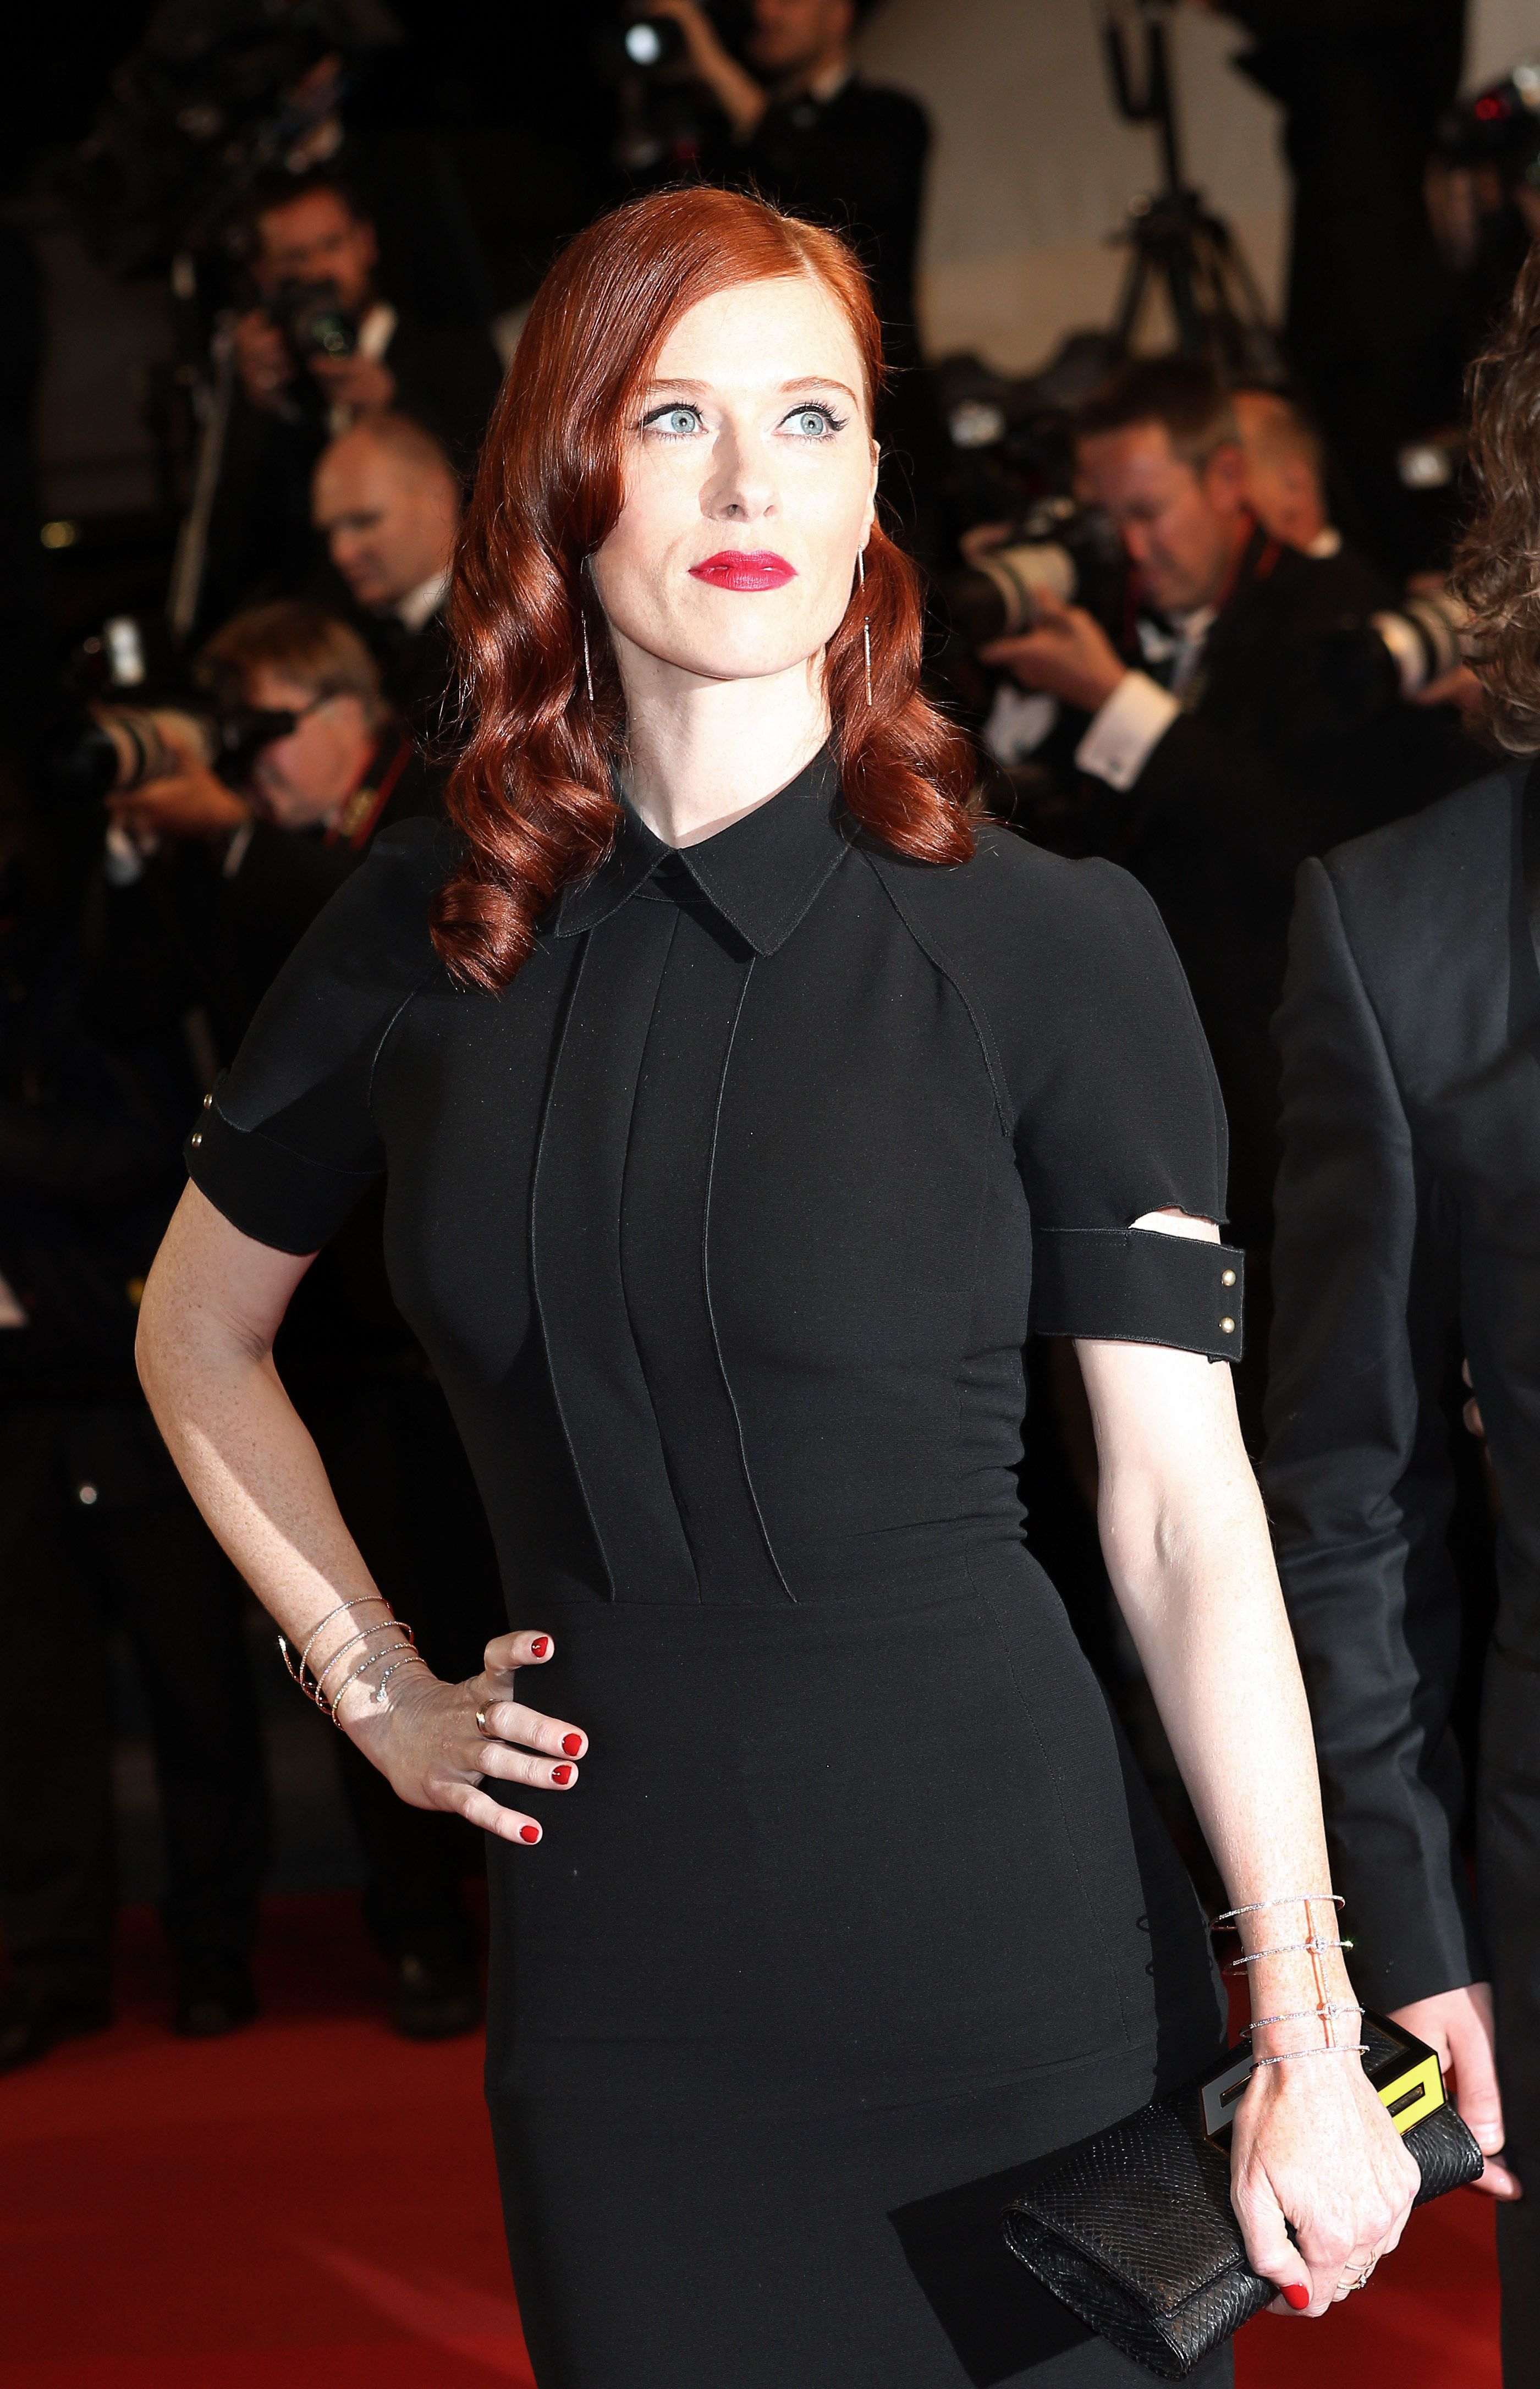 Audrey Fleurot Cannes 2014 Messika Jewels  Tutte Le Cose -7976